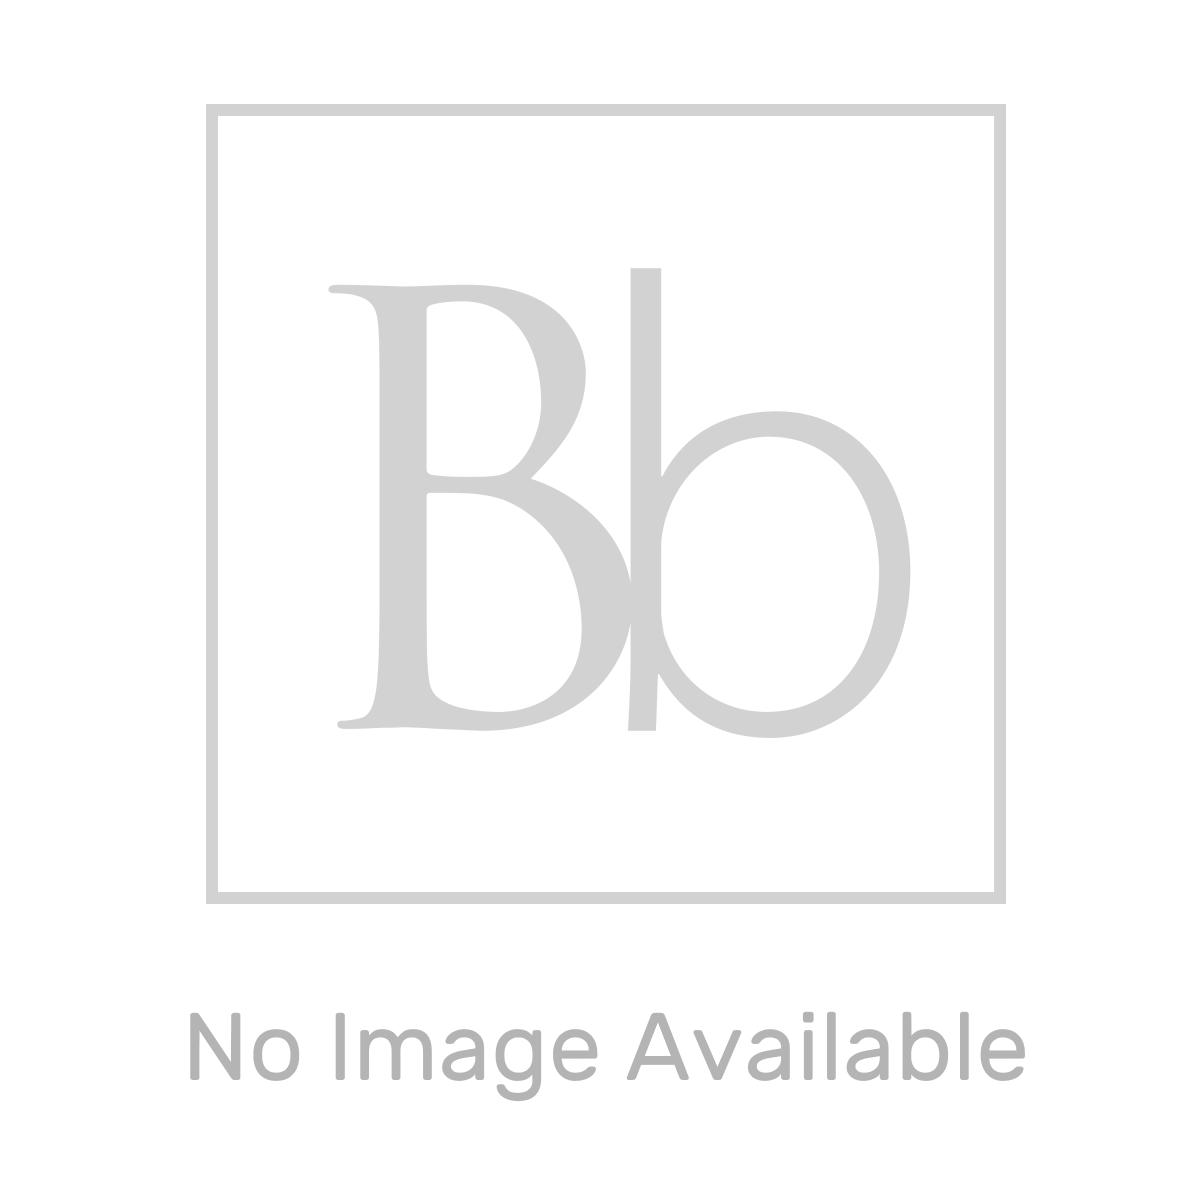 Premier Athena Driftwood End Panel 750mm